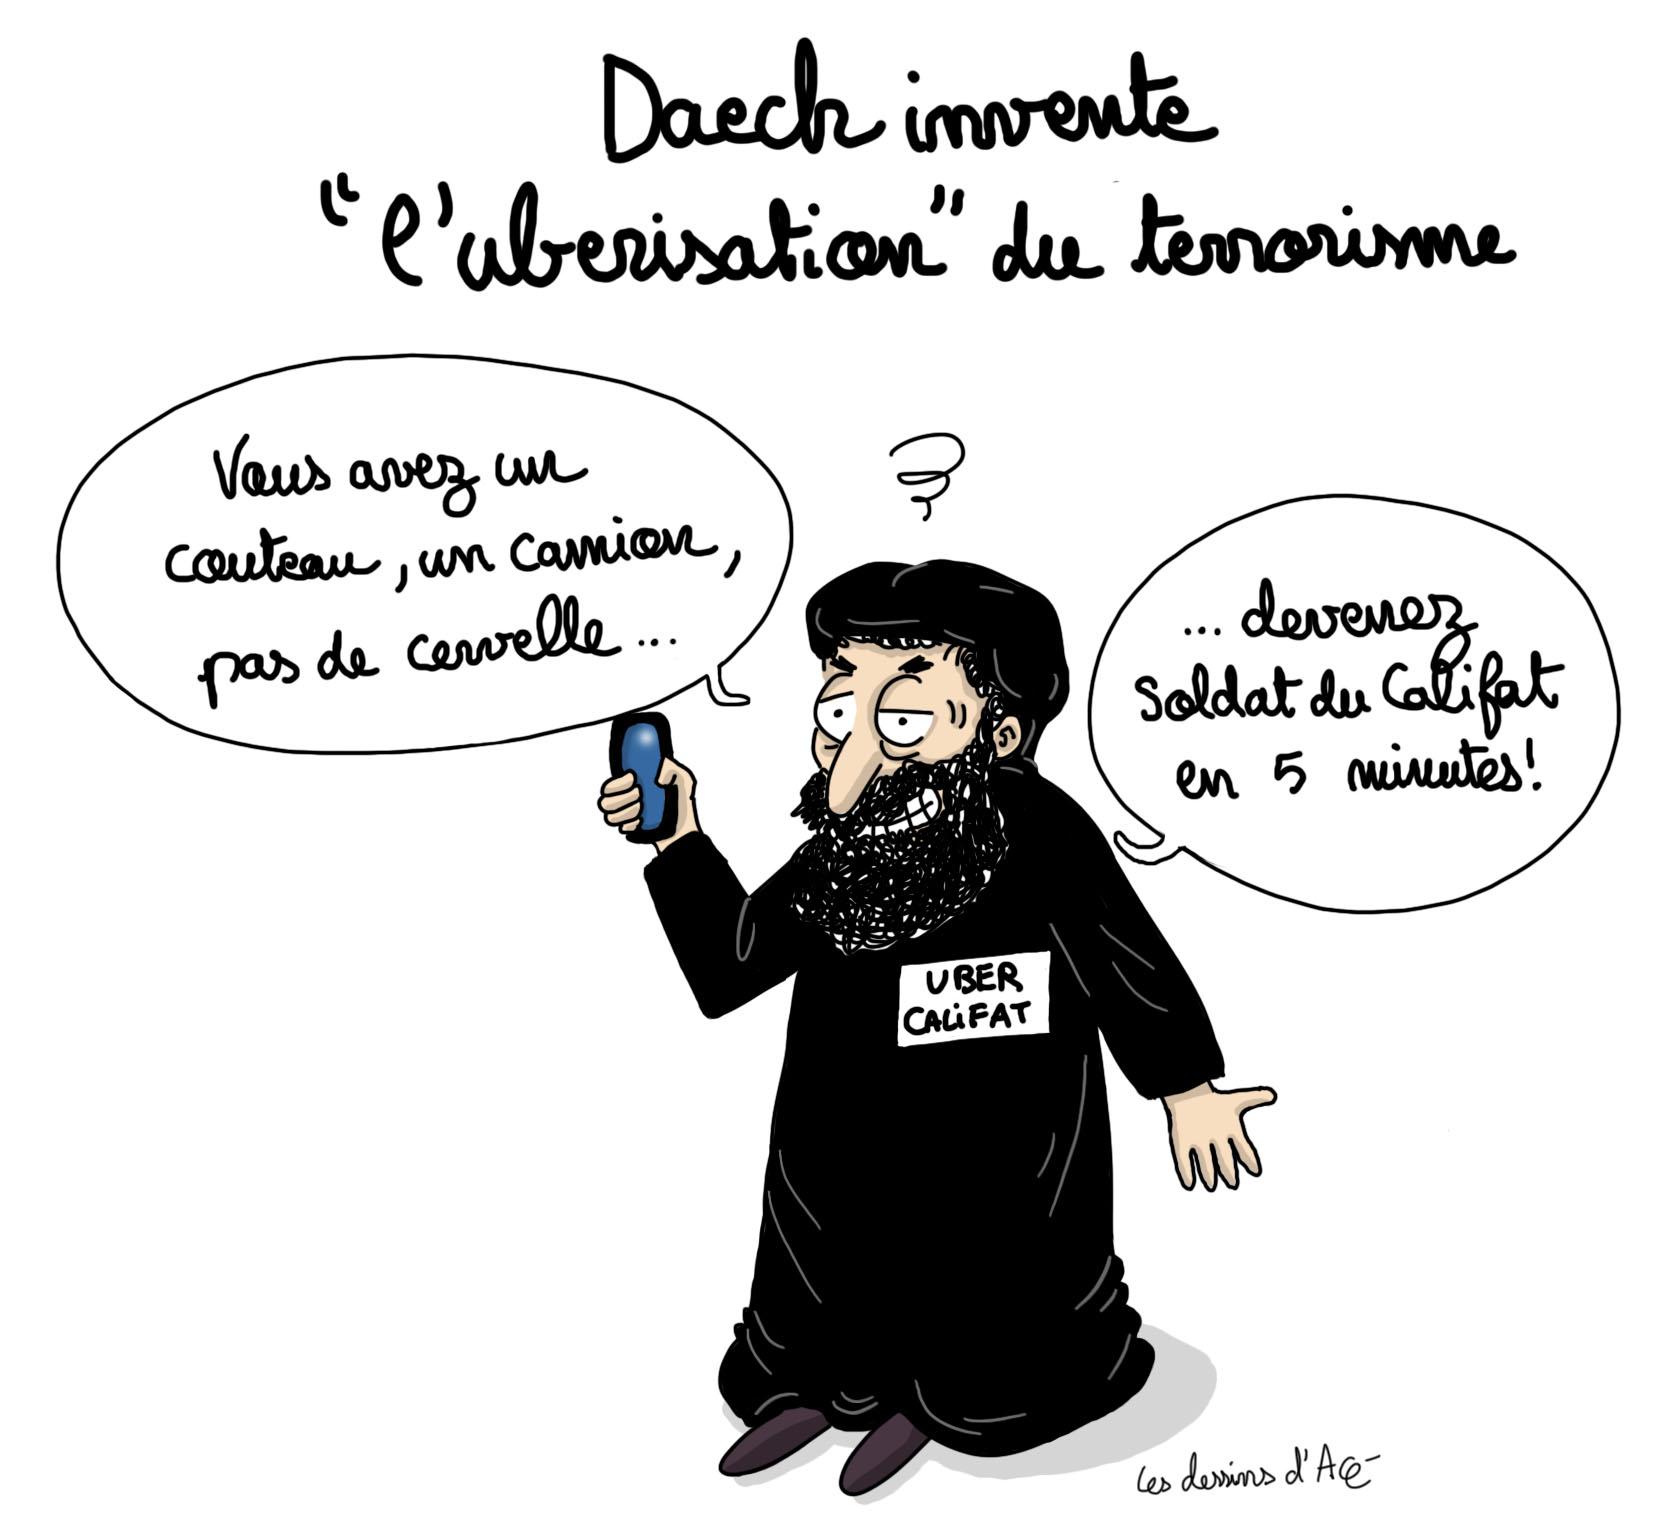 Uber-califat